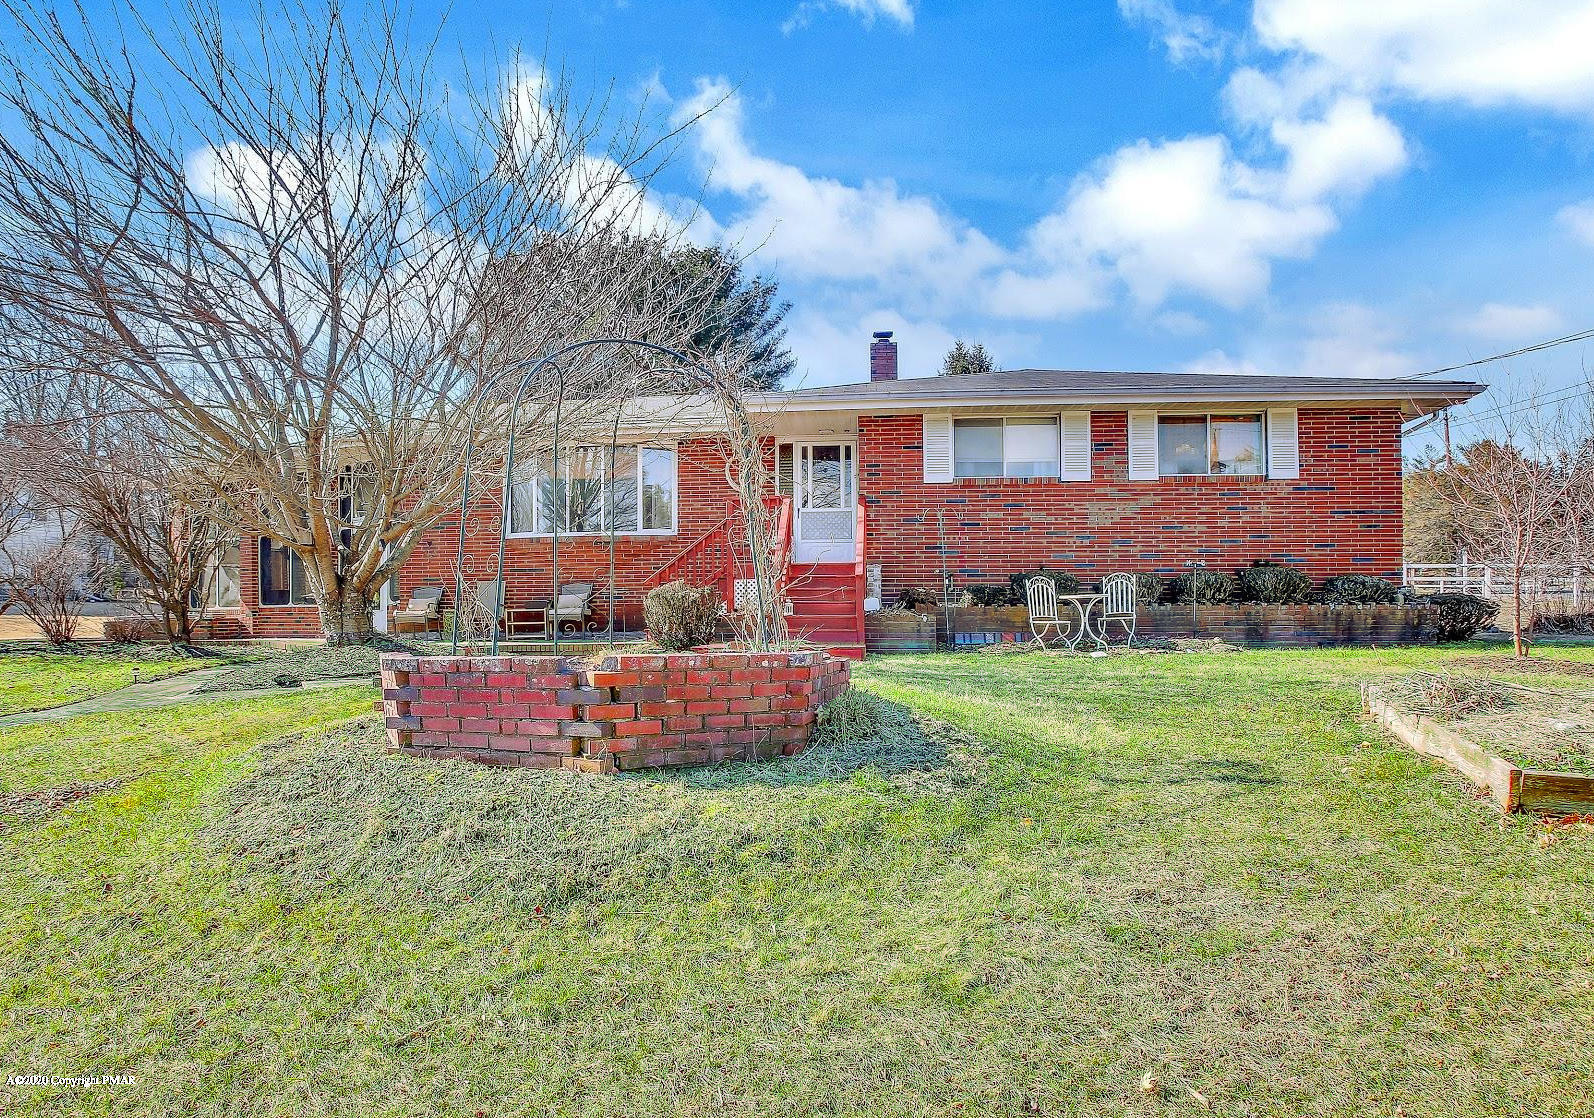 2097 Pleasant View Dr, Stroudsburg, PA 18360